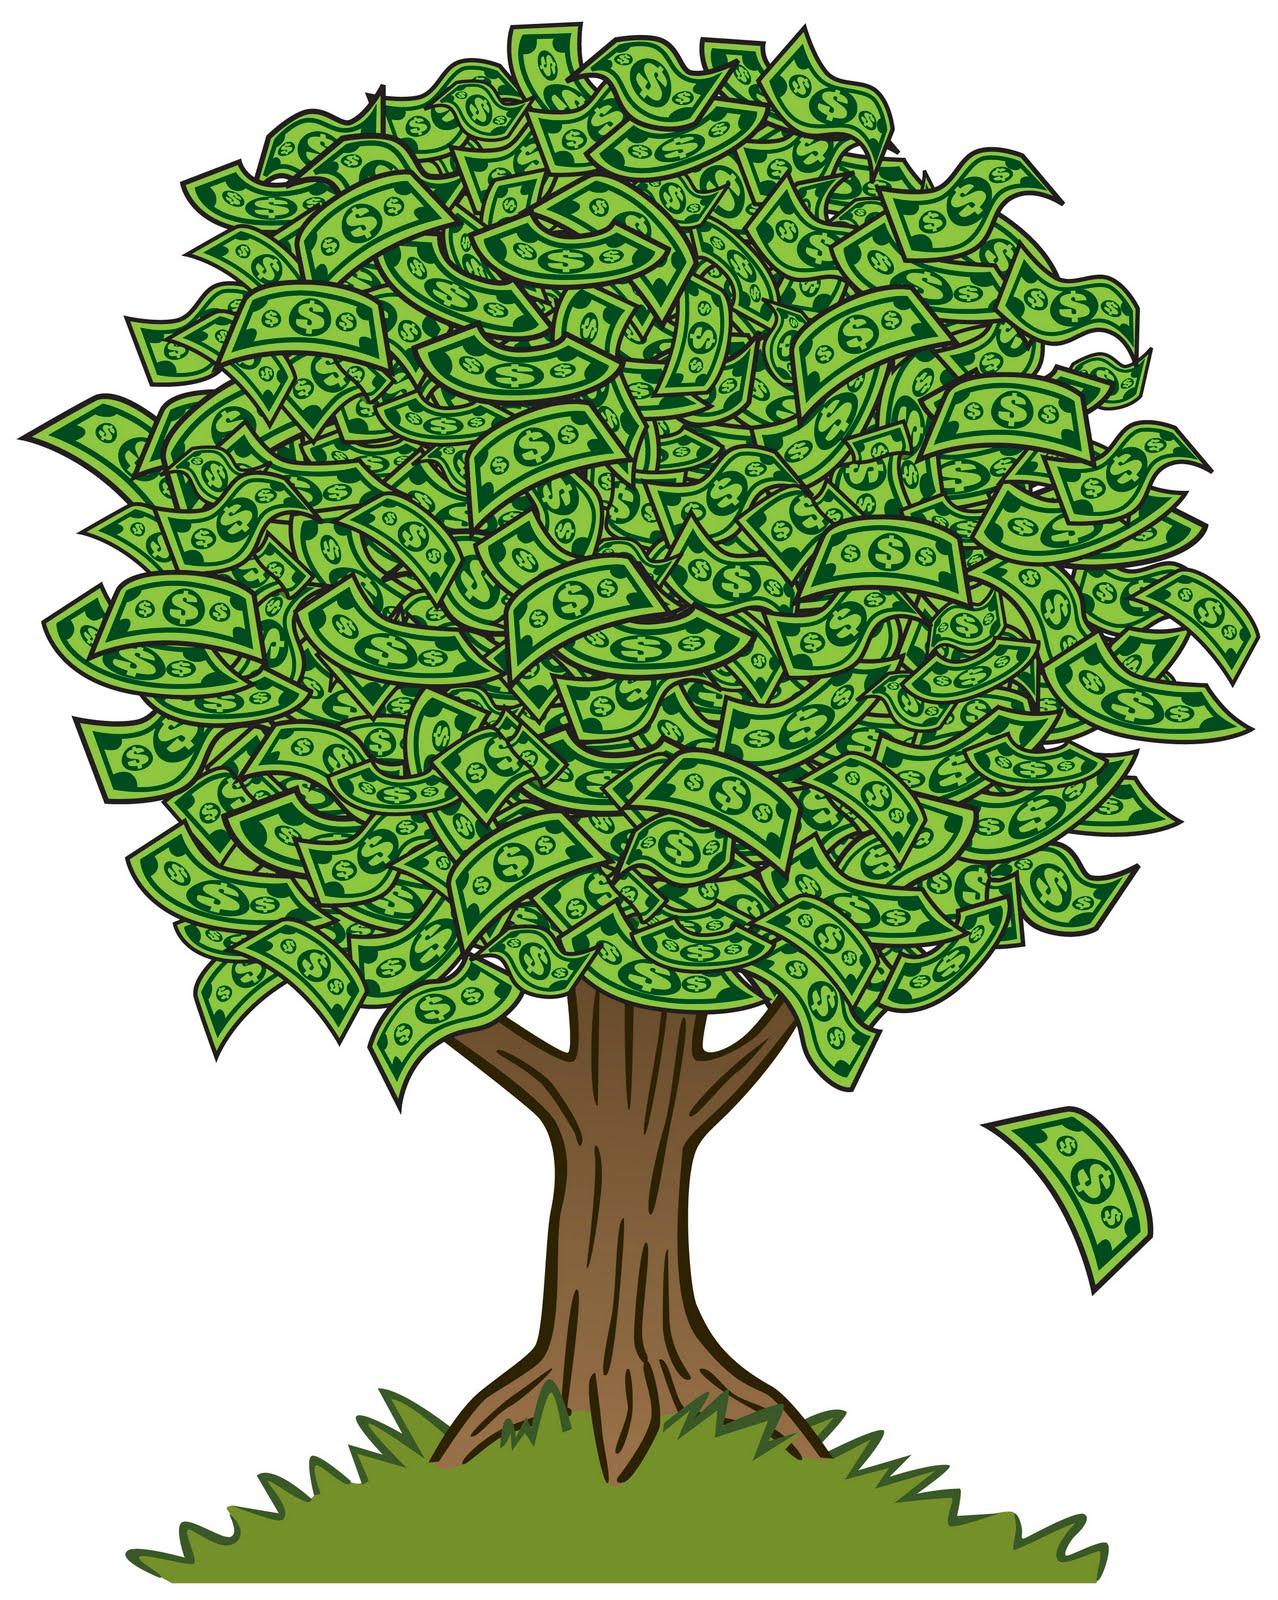 Instant payday loans bogalusa la picture 4